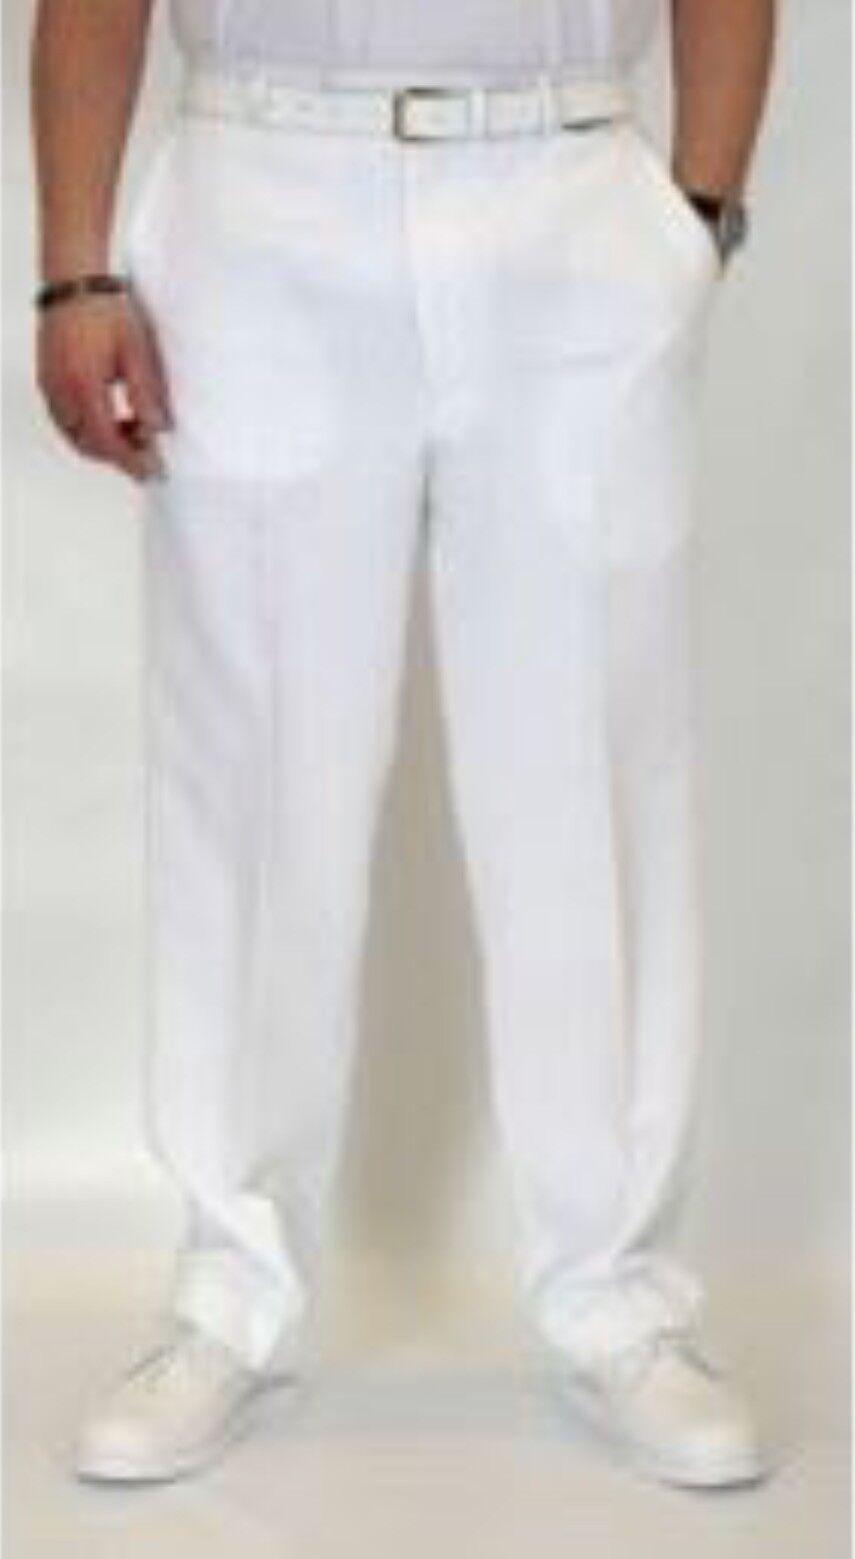 BNWT Emsmorn White Bowls Trousers for Men